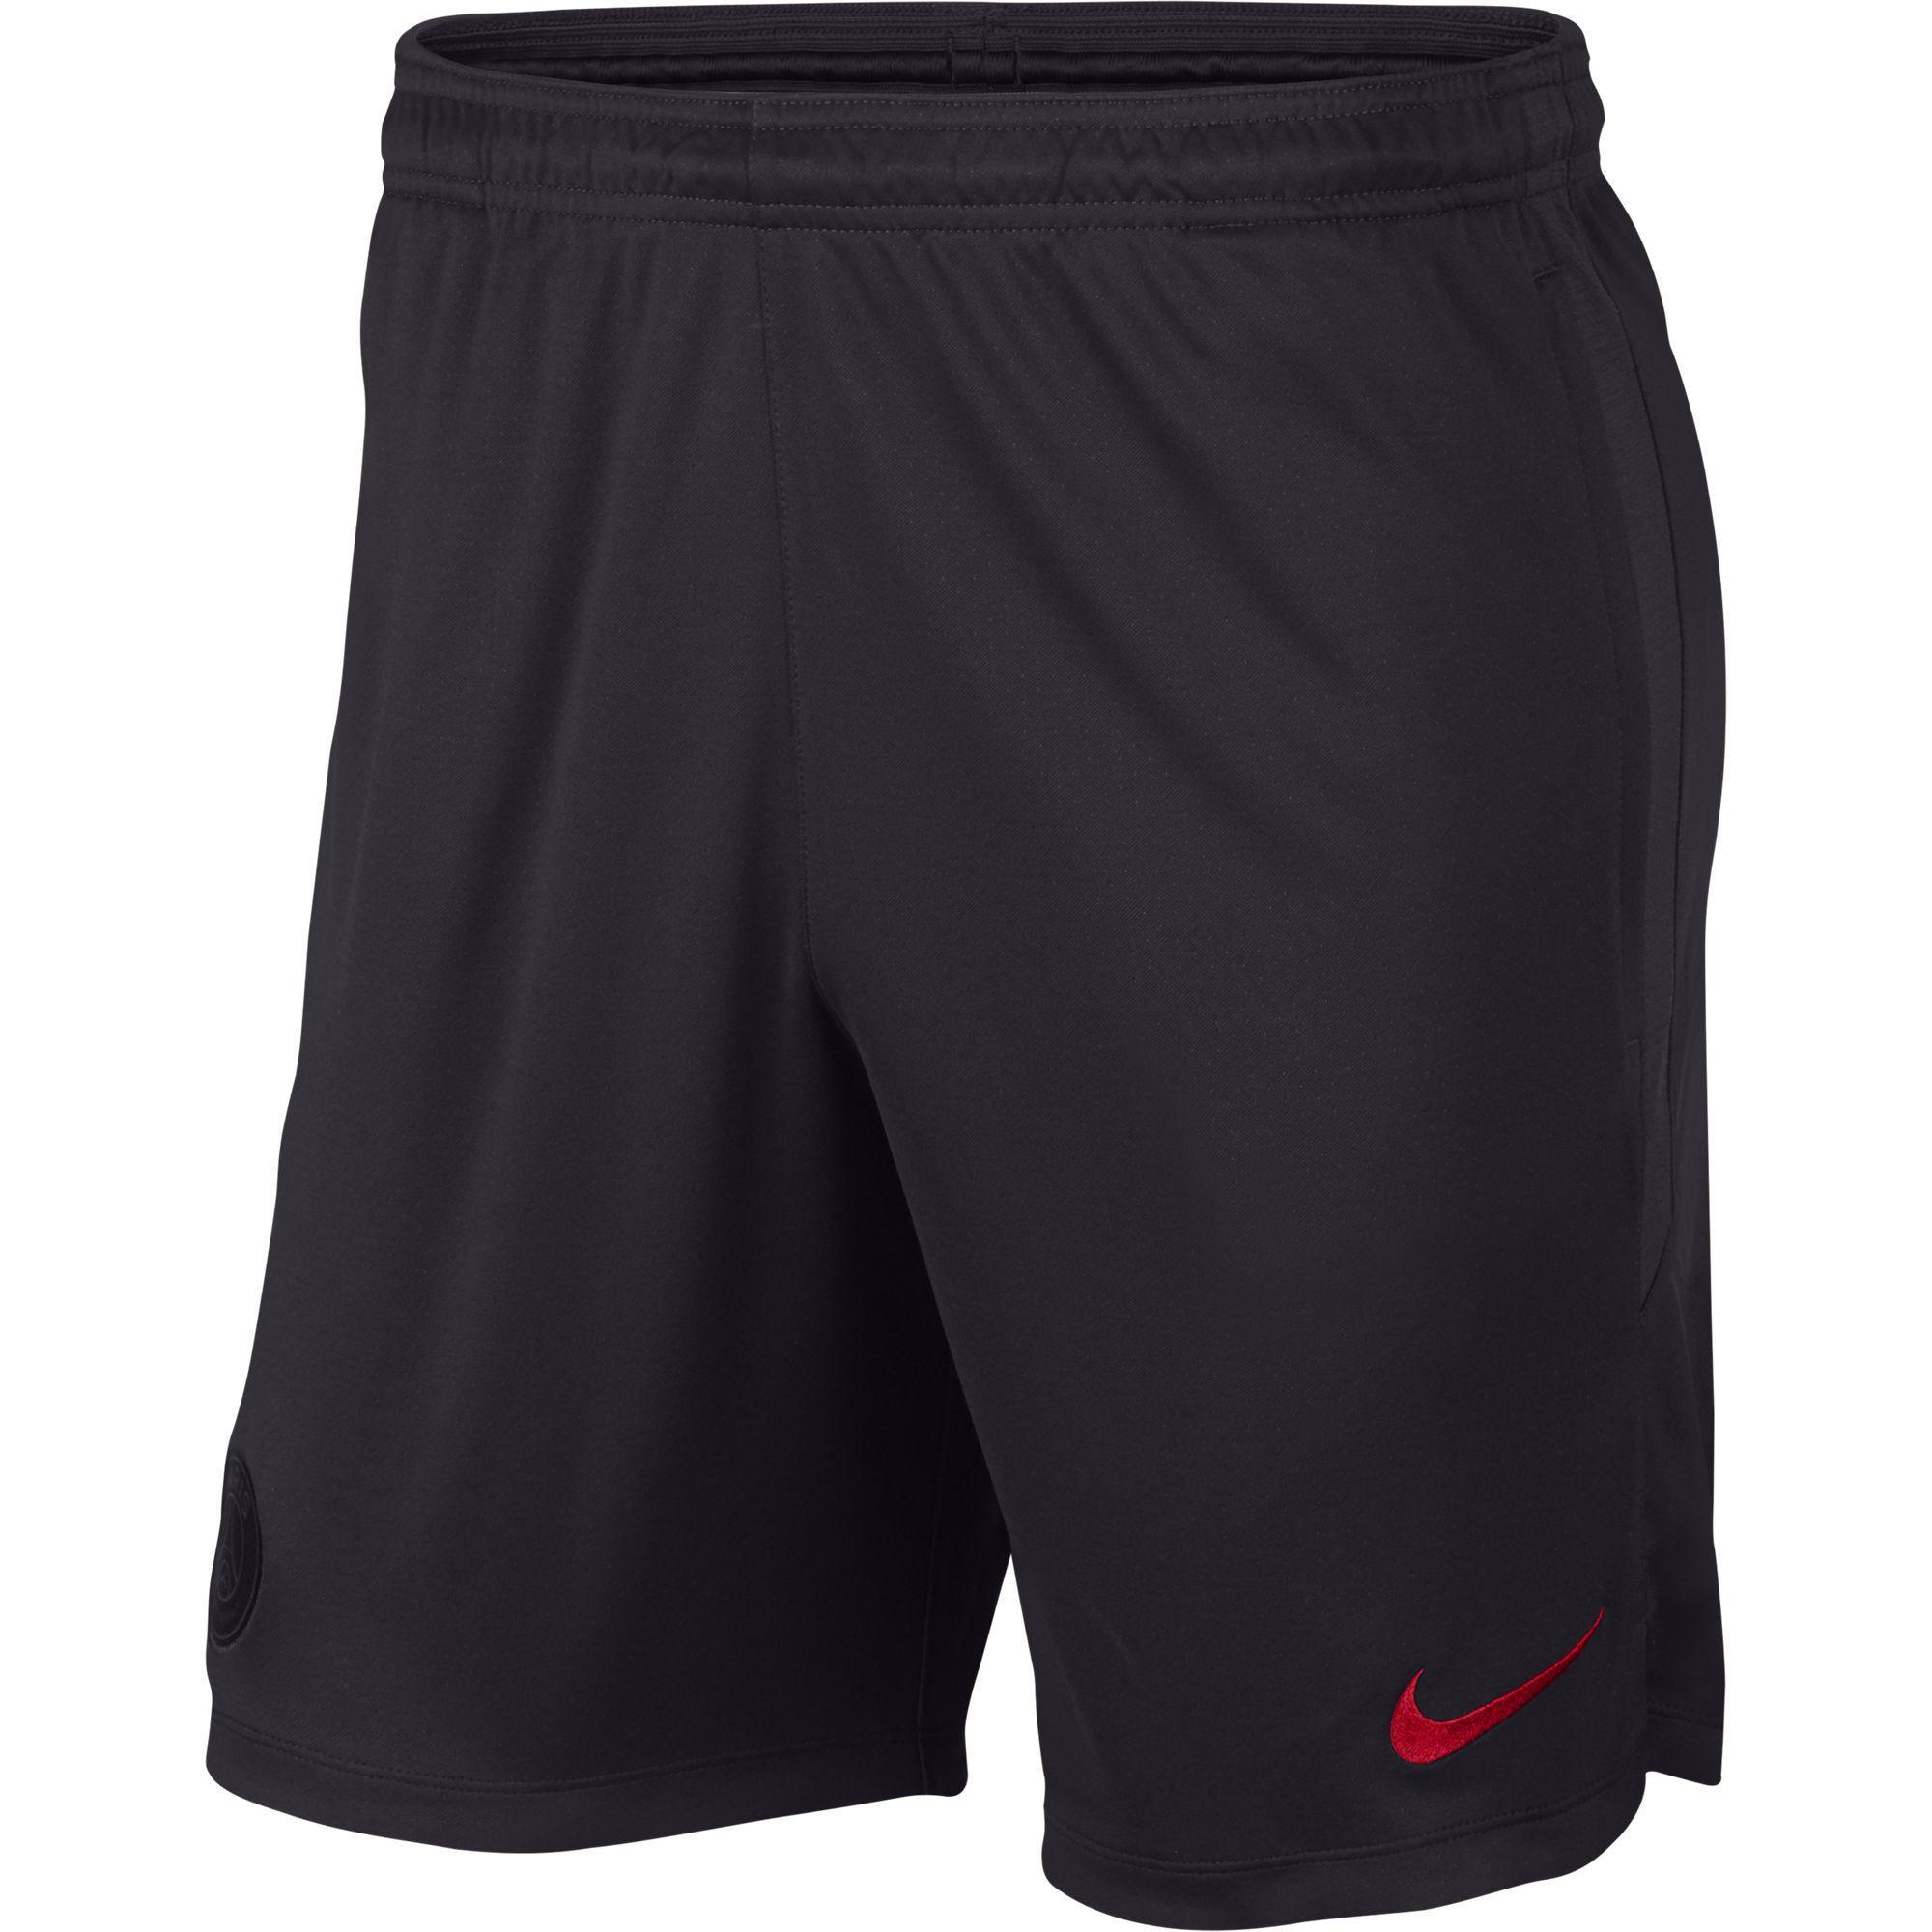 Nike Pantaloncino Allenamento Paris Saint Germain   19/20